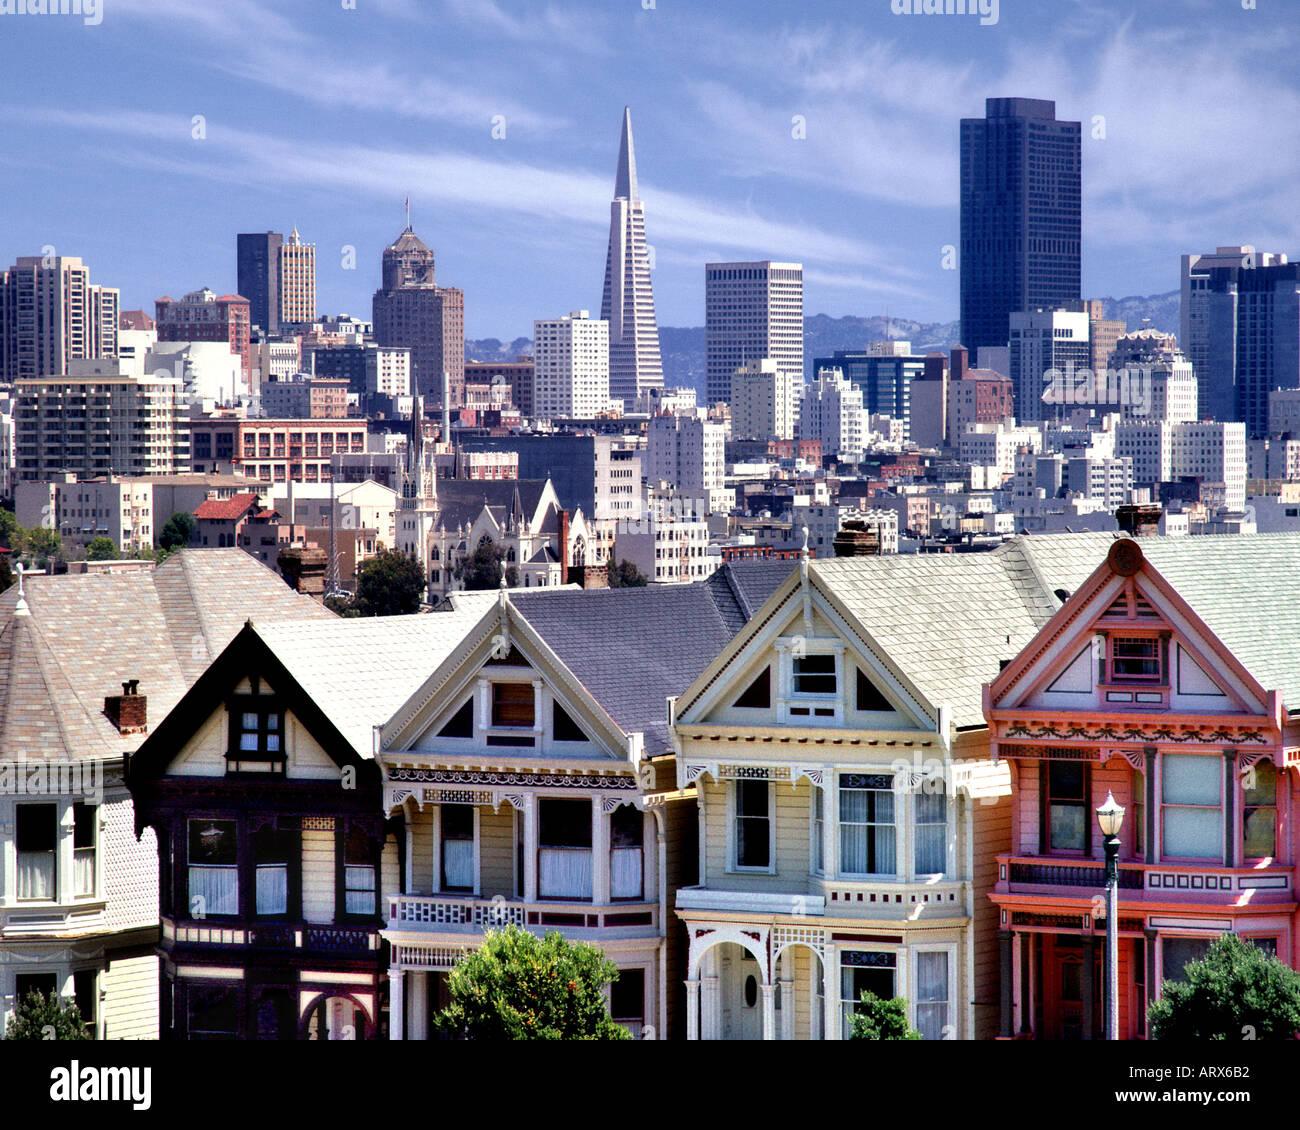 USA - CALIFORNIA: Alamo Square in San Francisco - Stock Image